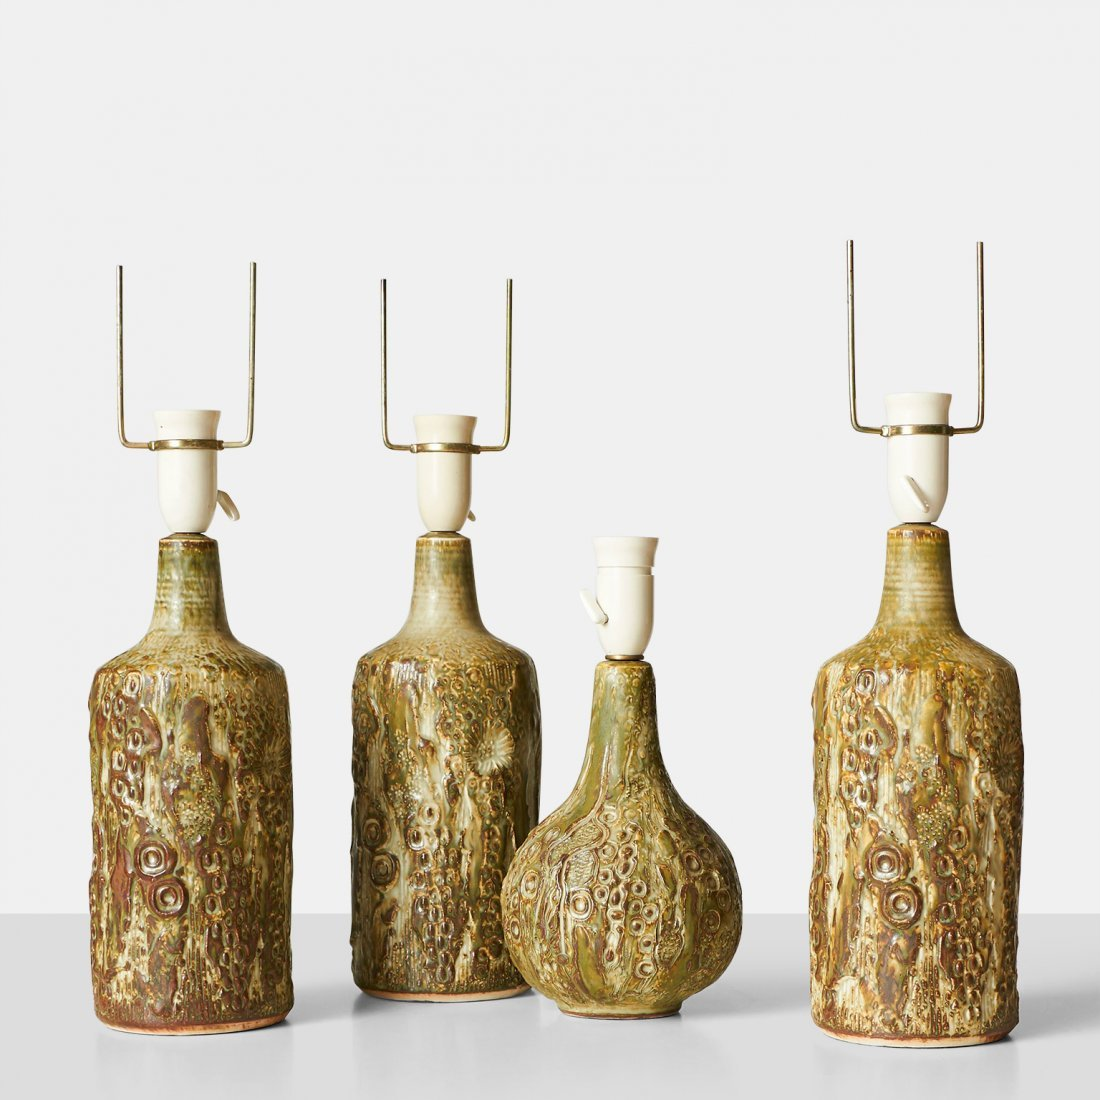 Jorgen Mogensen, Collection of Table Lamps